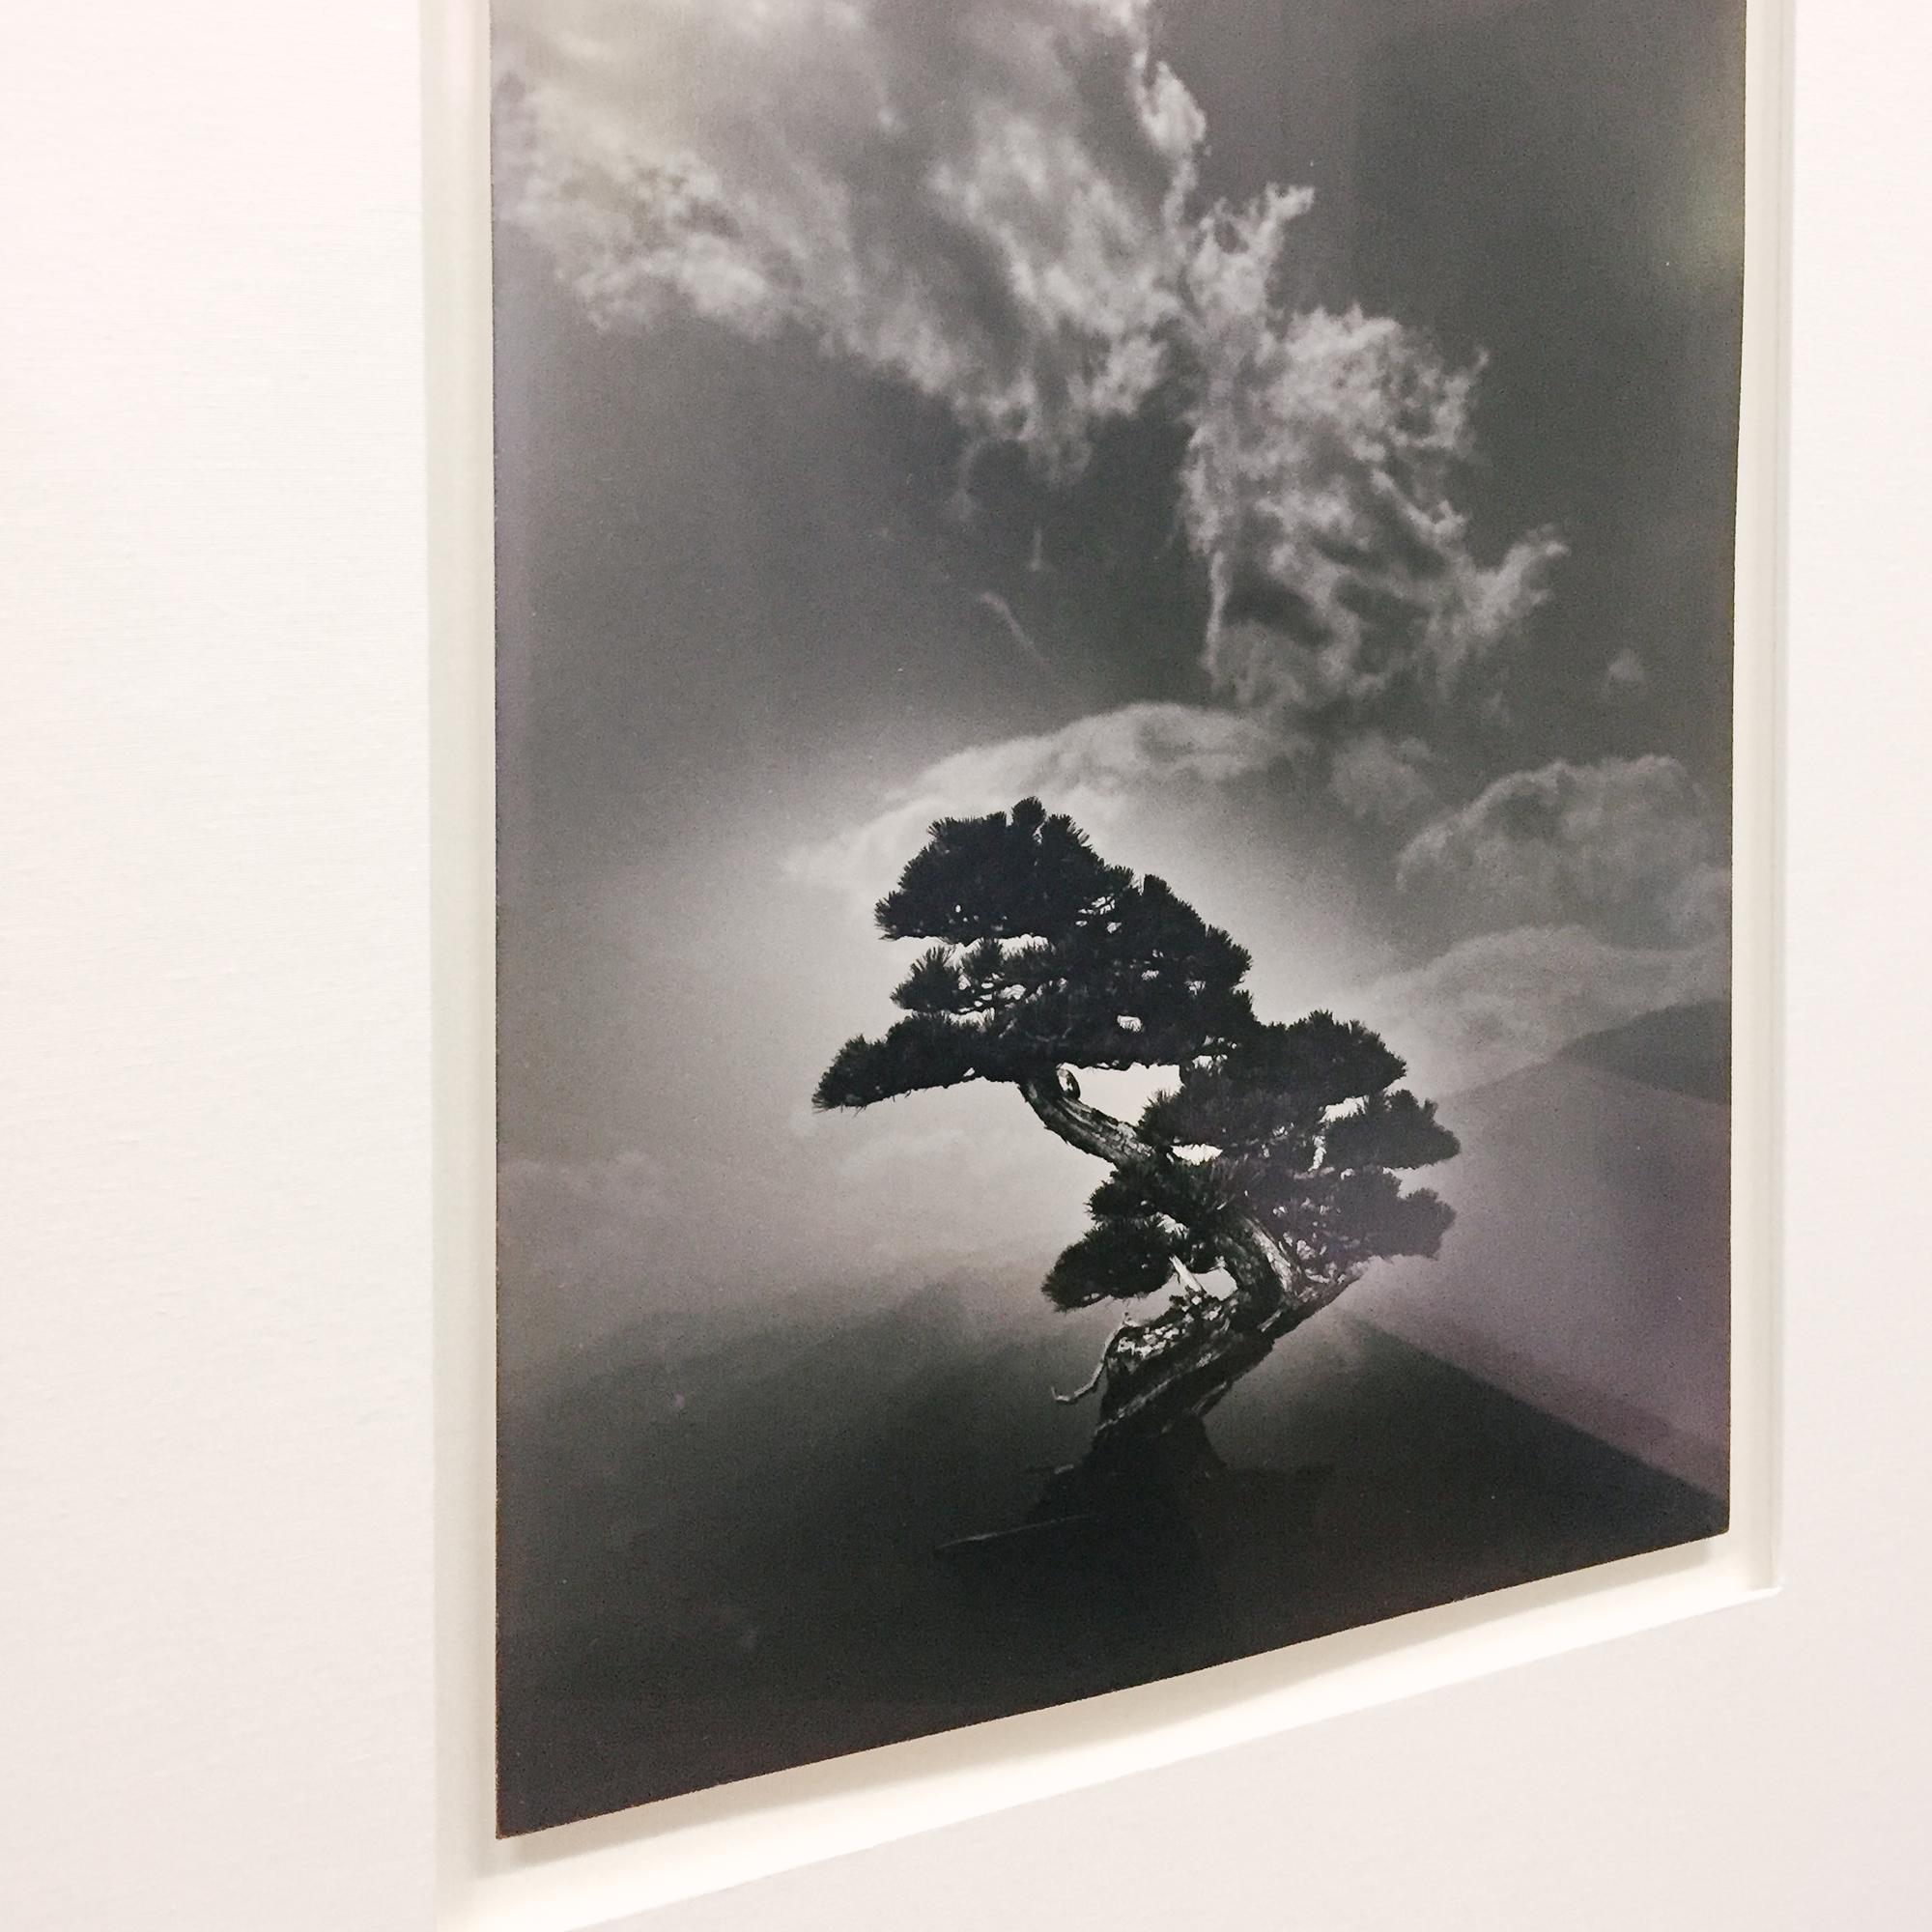 thephotoexhibitionarchive_yamamoto-4